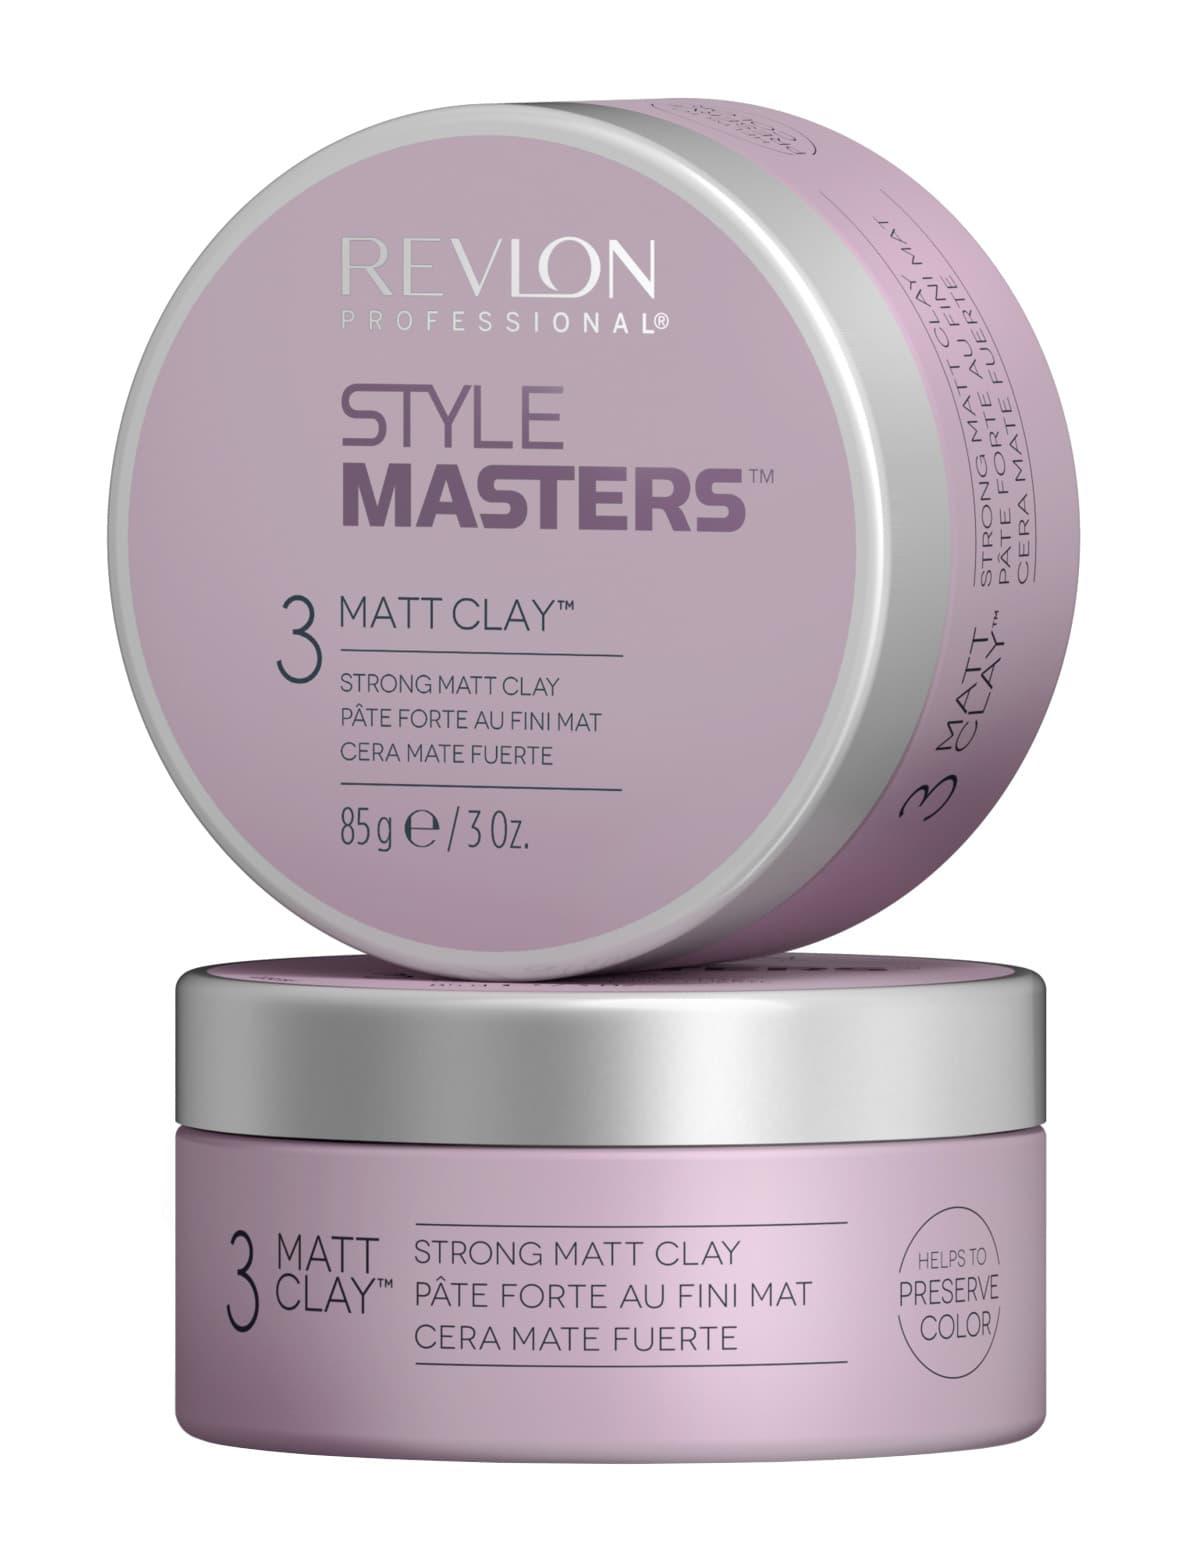 Revlon Professional Style Masters Creator Matt Clay Глина Моделирующая Для Волос